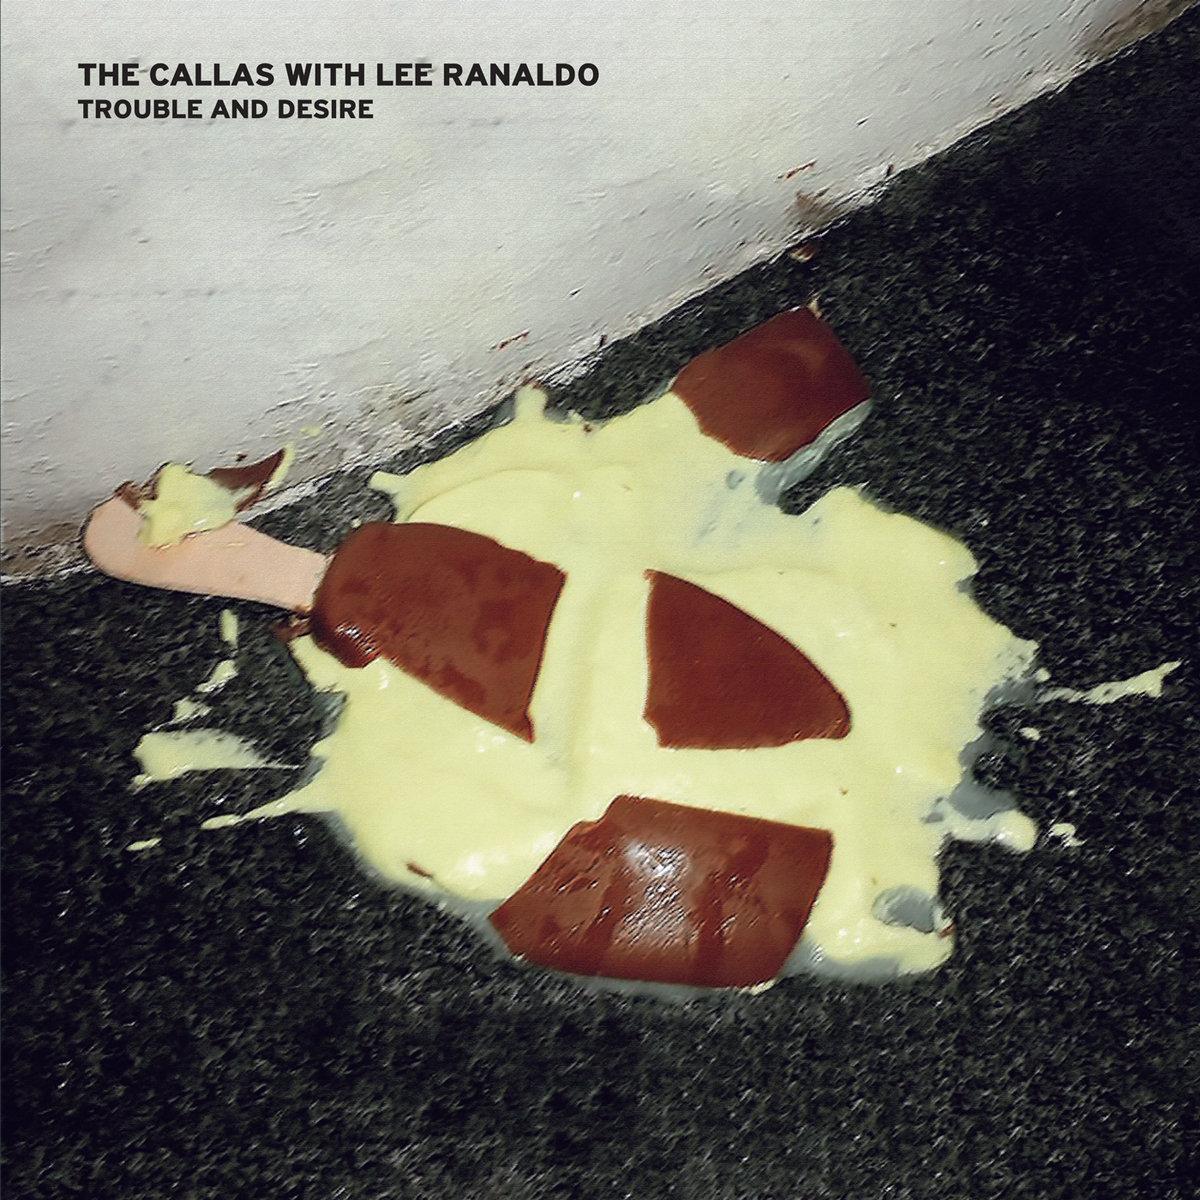 The Callas with Lee Ranaldo - Trouble and Desire